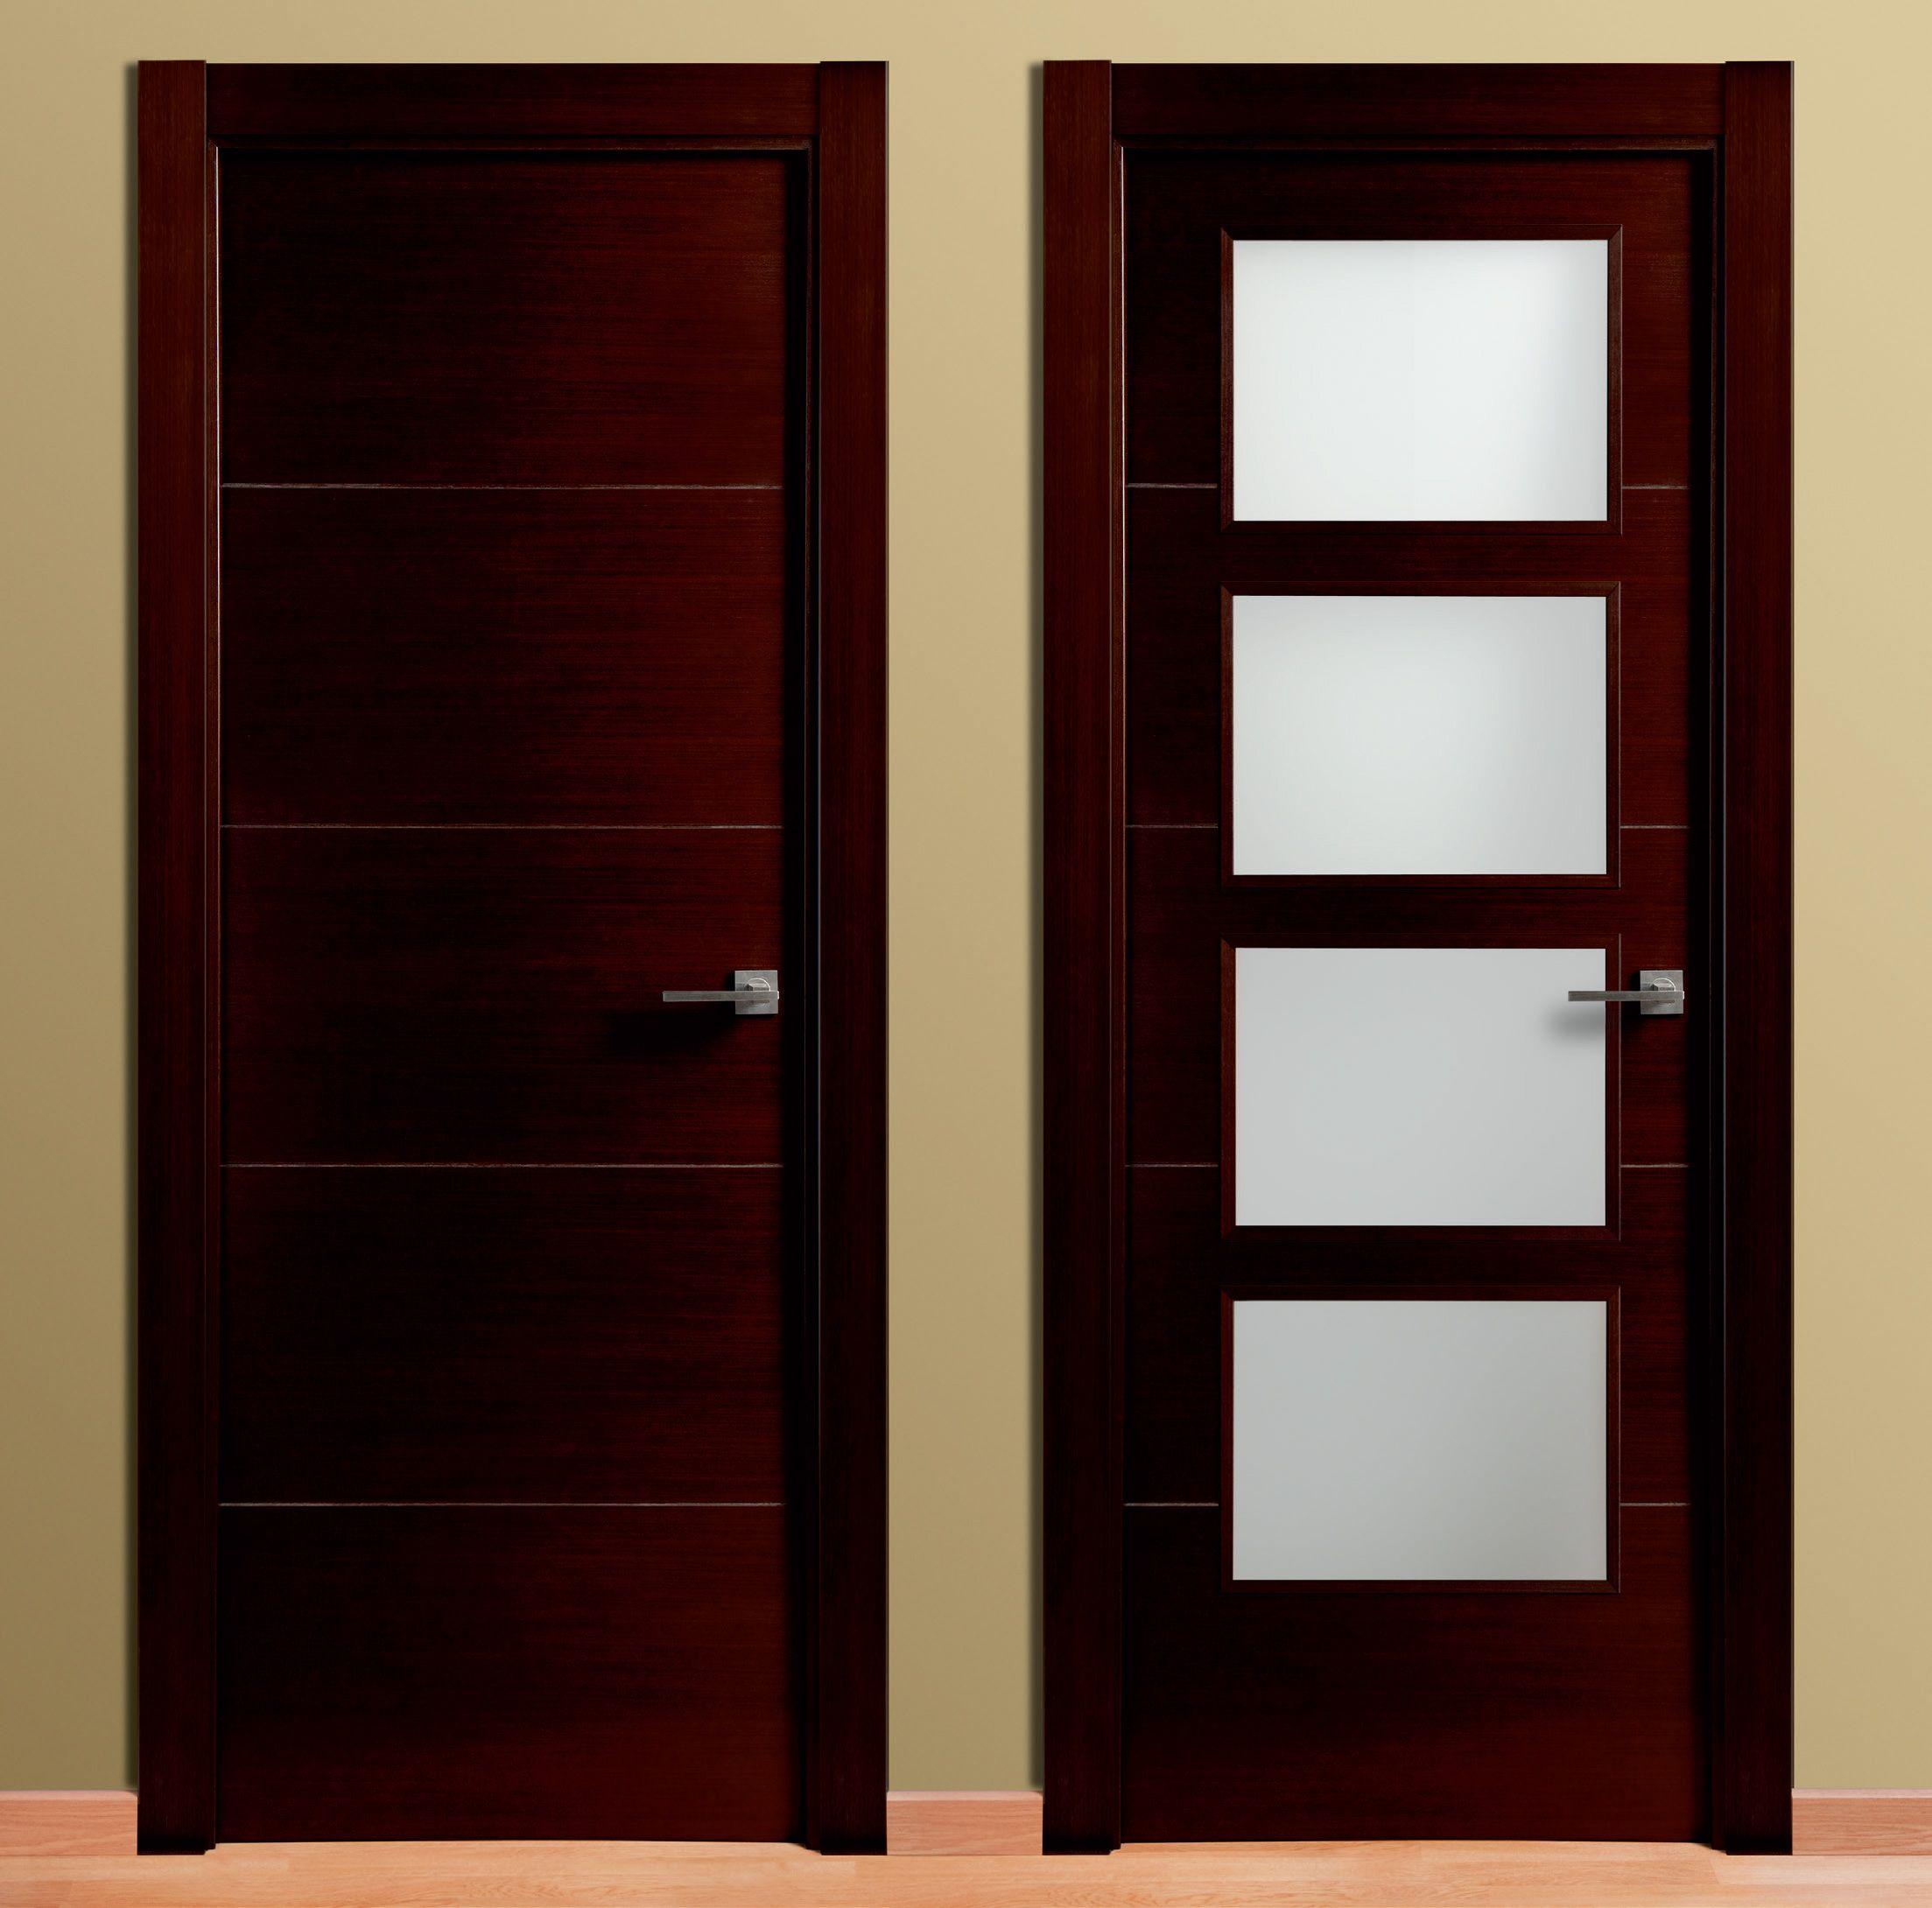 Puerta 4 ranuras en madera puertas carsal socios aitim for Remate de puertas de madera